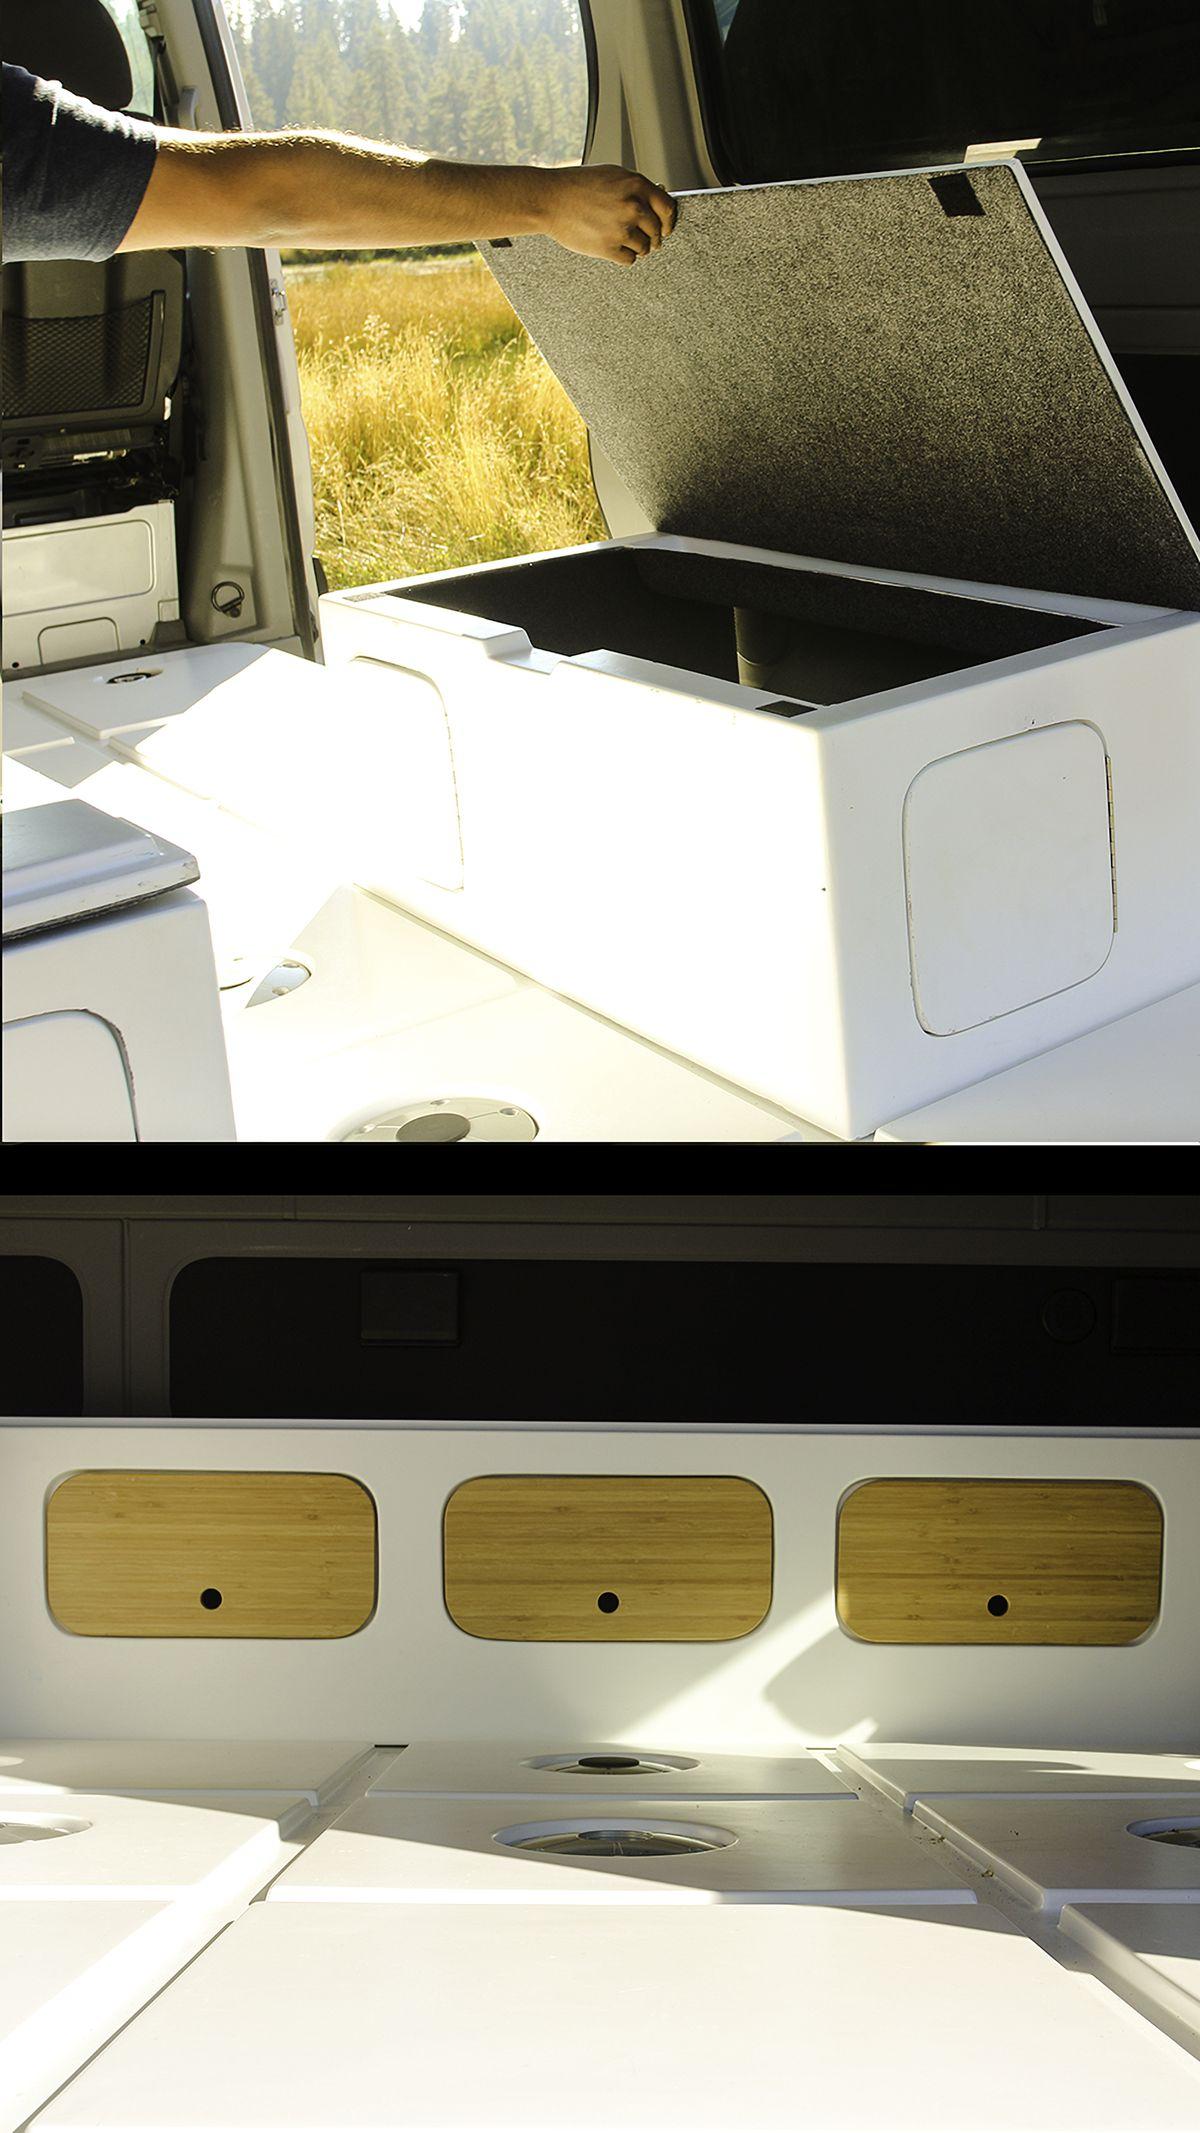 White fiberglass base floors and a white box for storage sits inside a Mercedes Sprinter van.